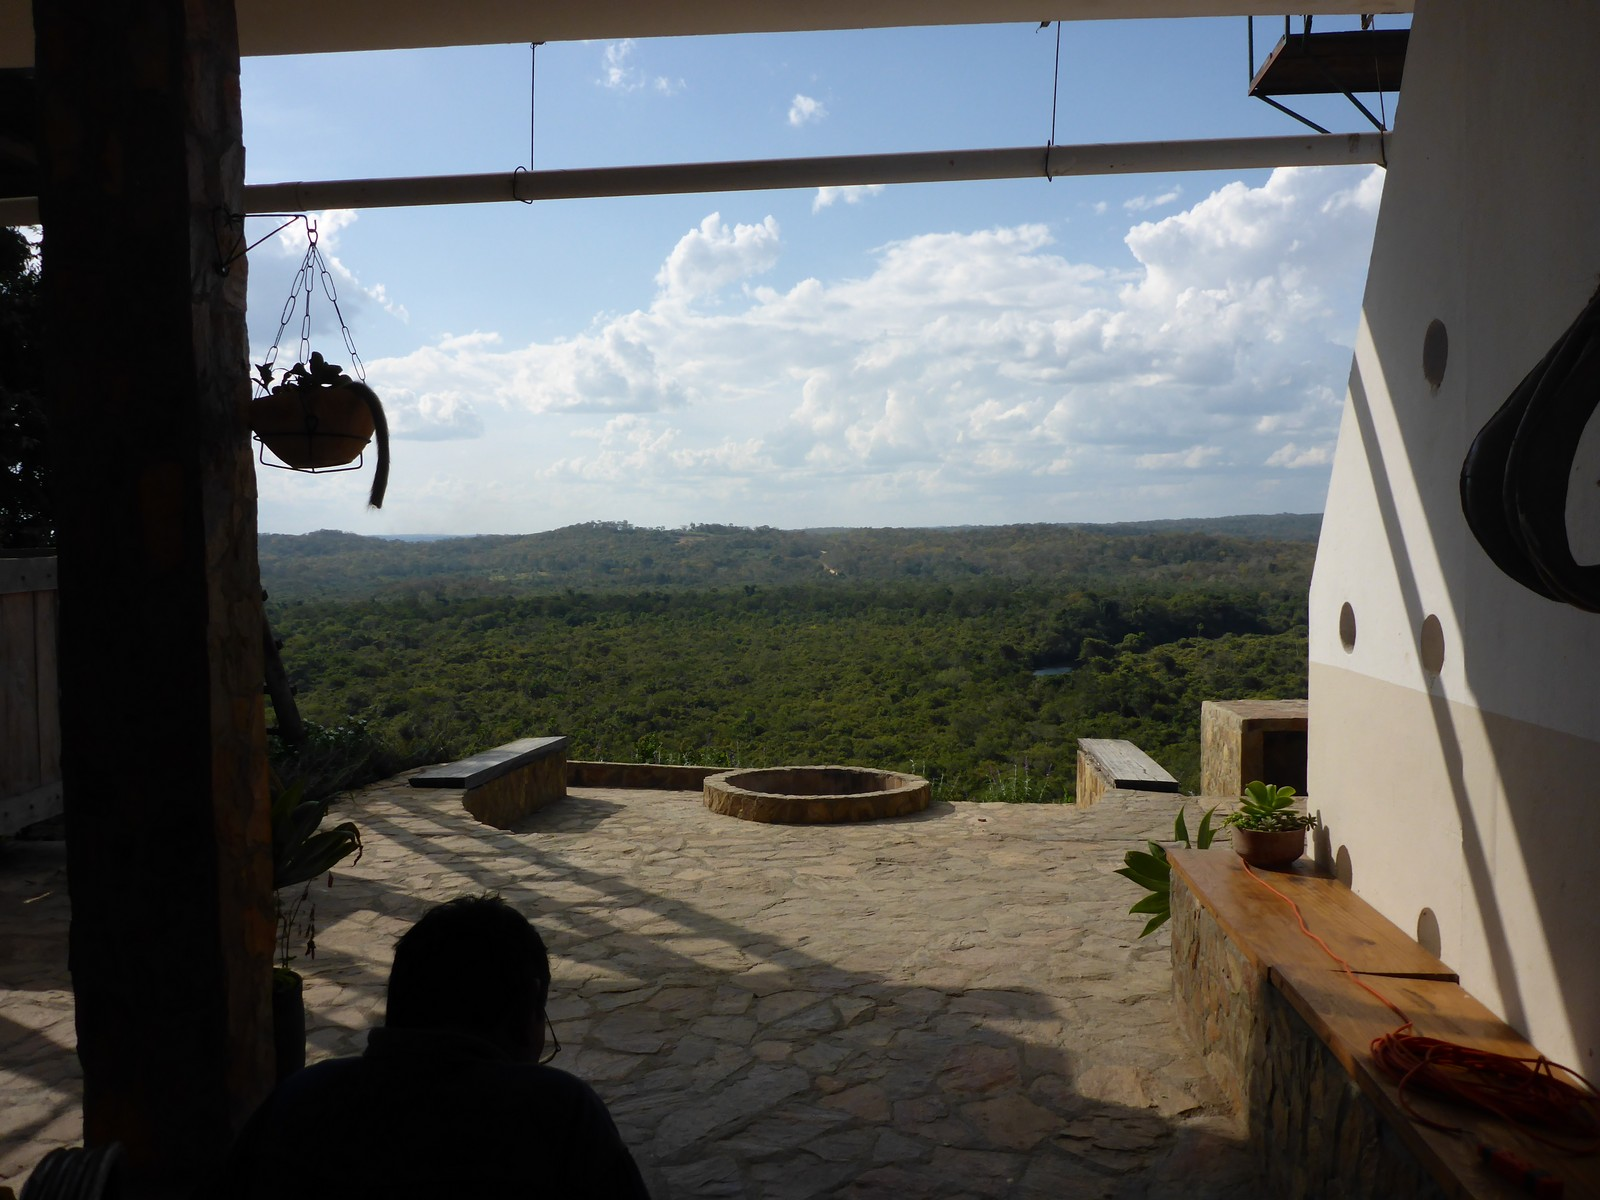 San Miguelito Wildlife Conservation